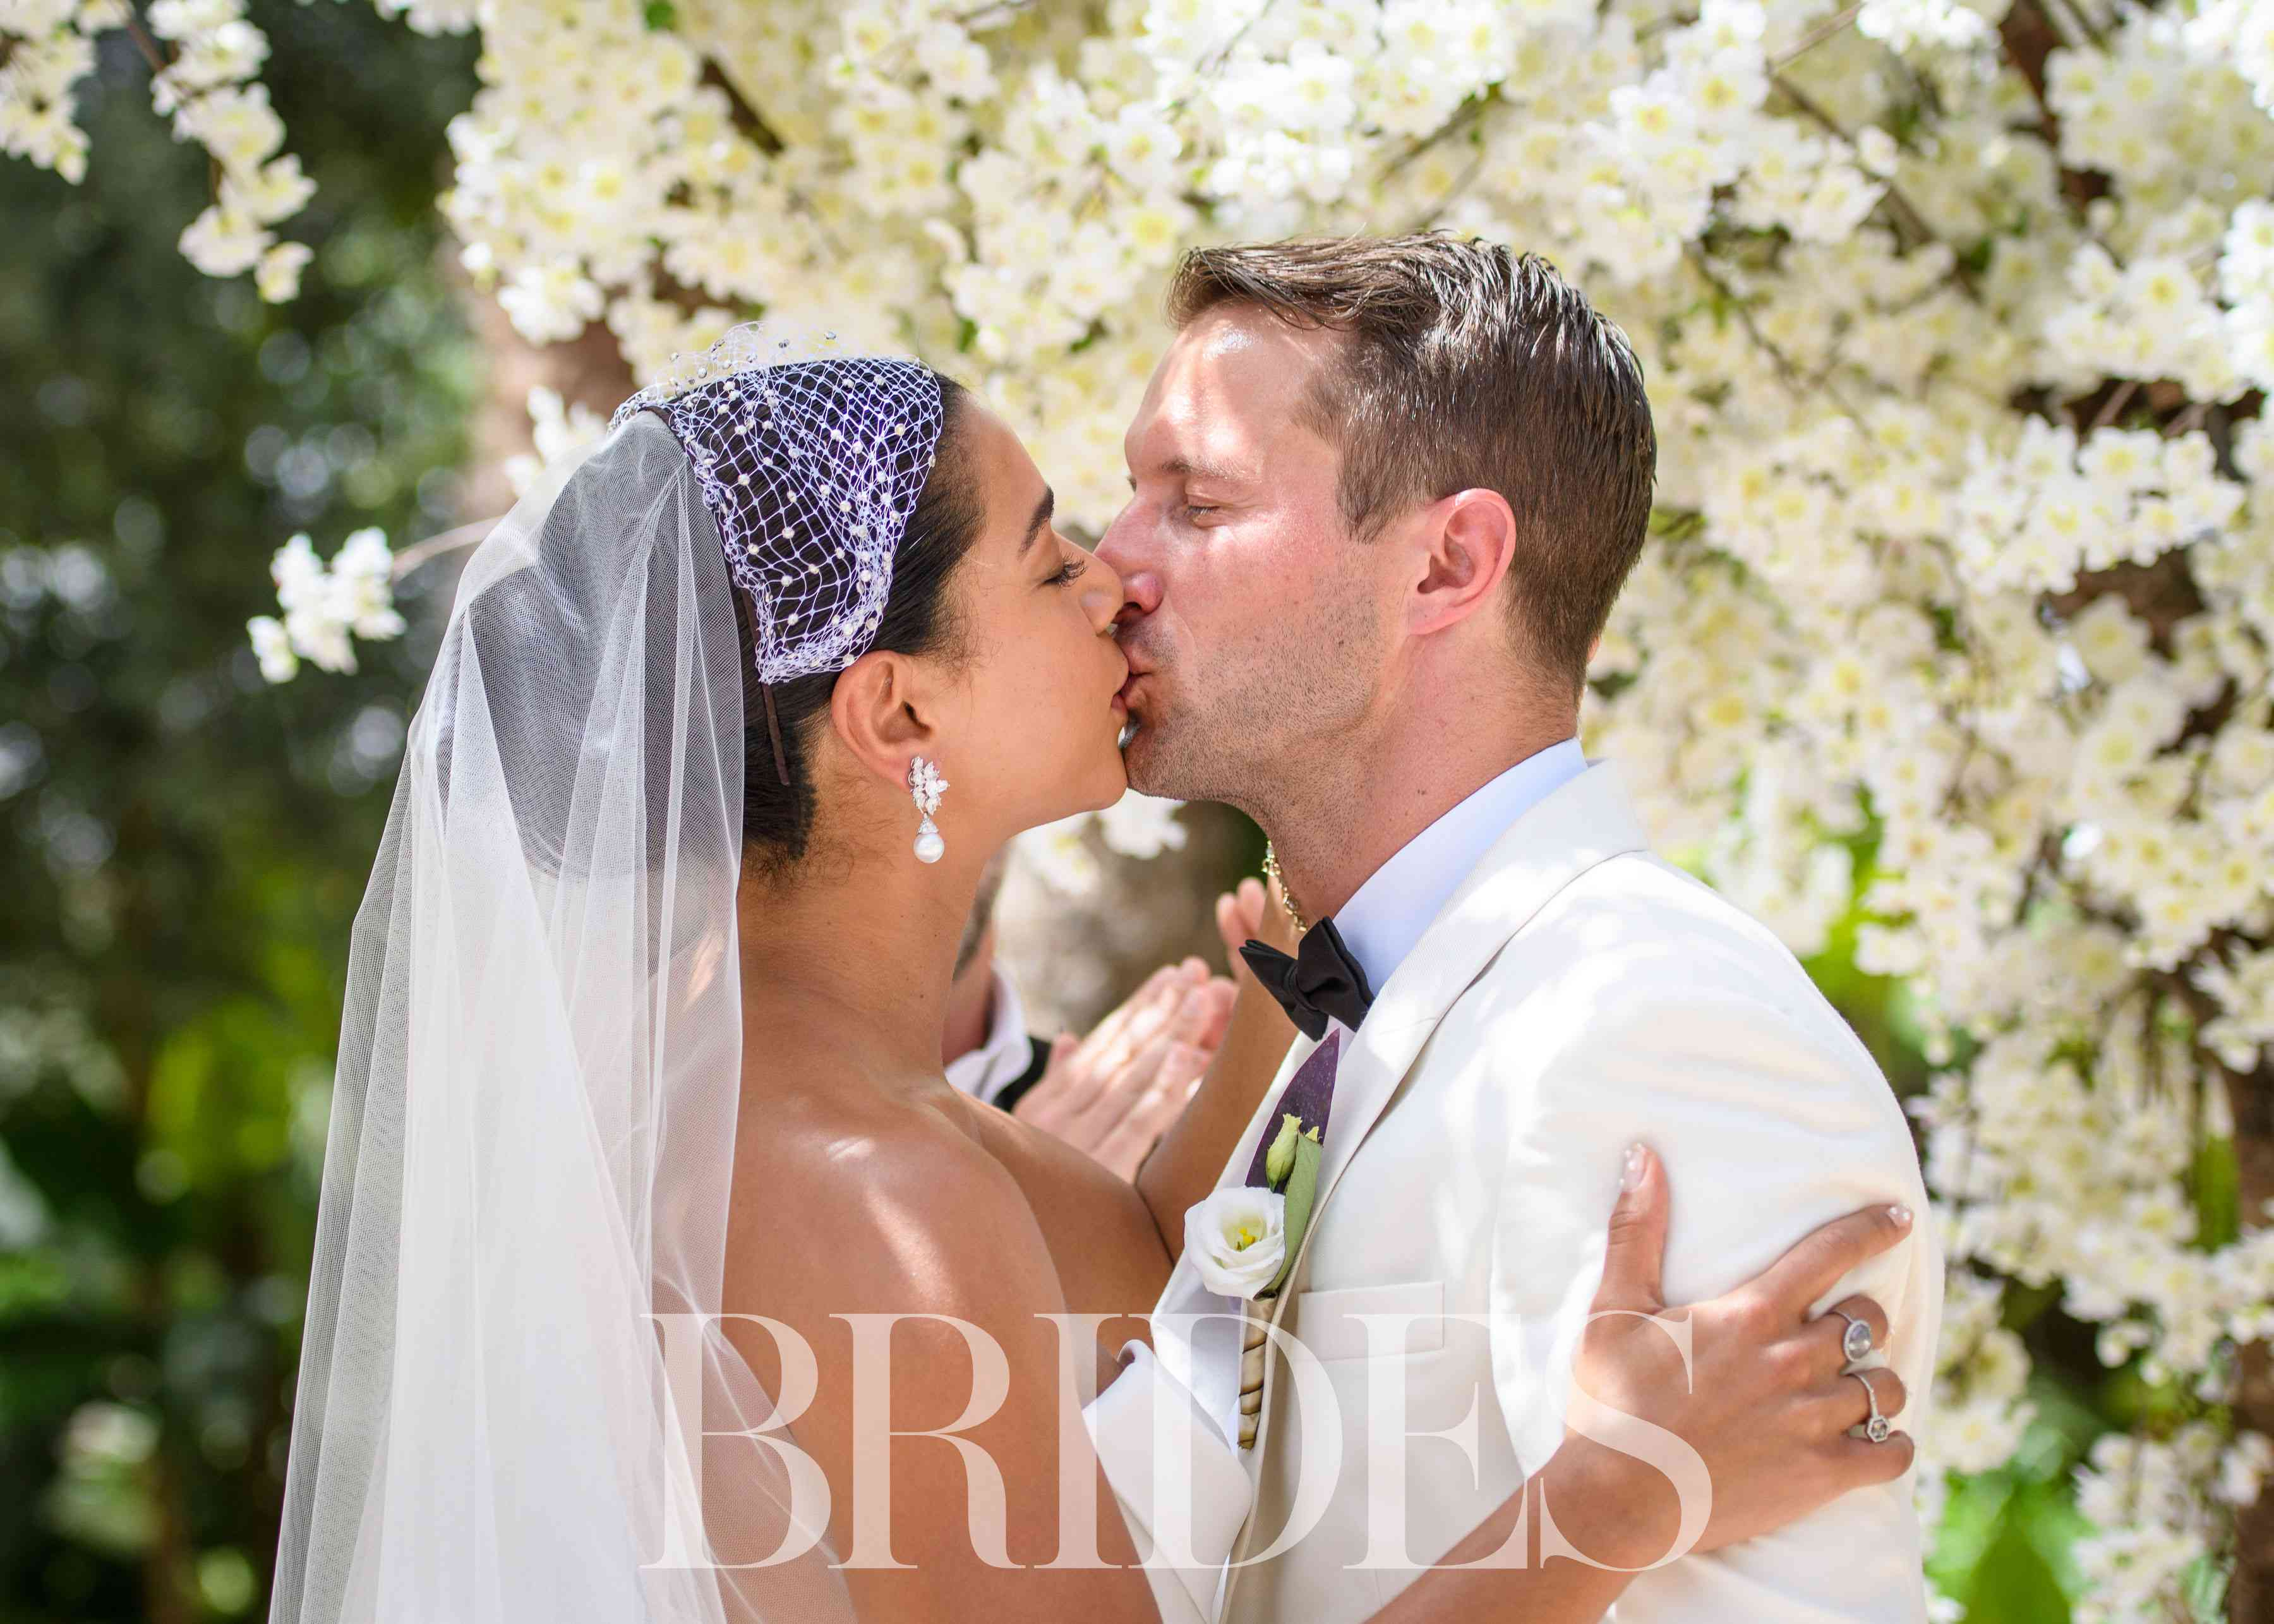 Hannah Bronfman and Brendan Fallis First Kiss